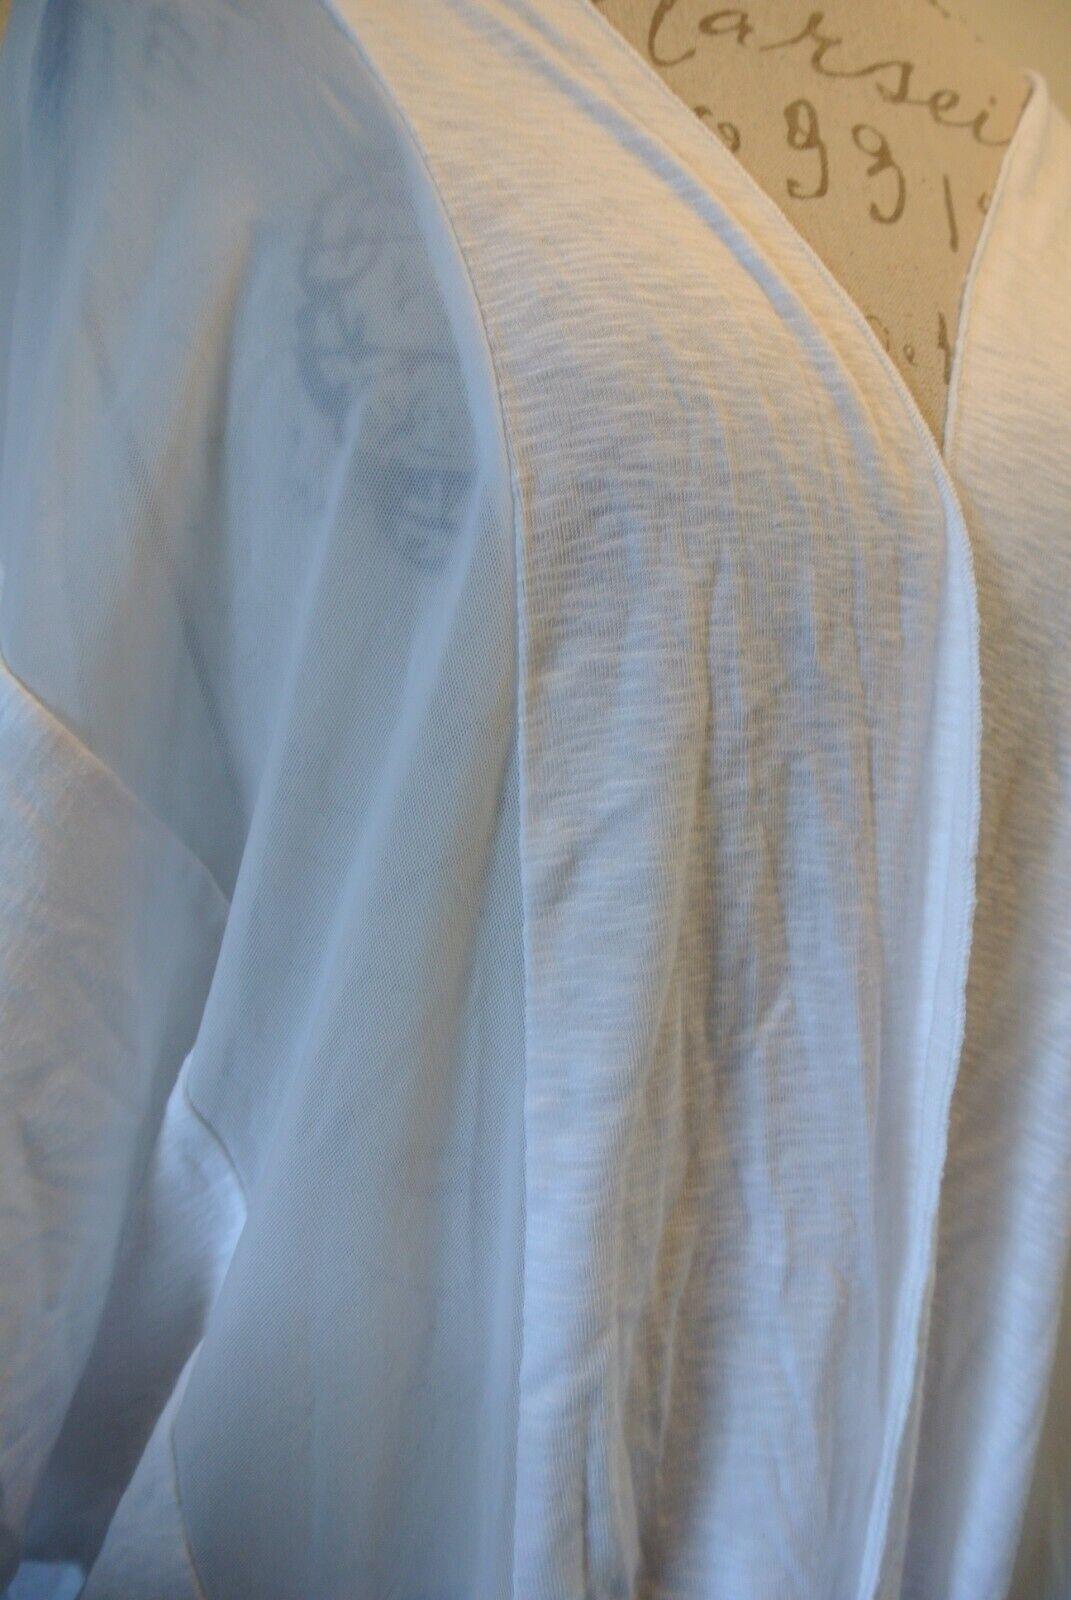 NWT 78 Love Scarlett Modal Open Soft Lightweight Loose Cardigan New Ivory White - $7.99